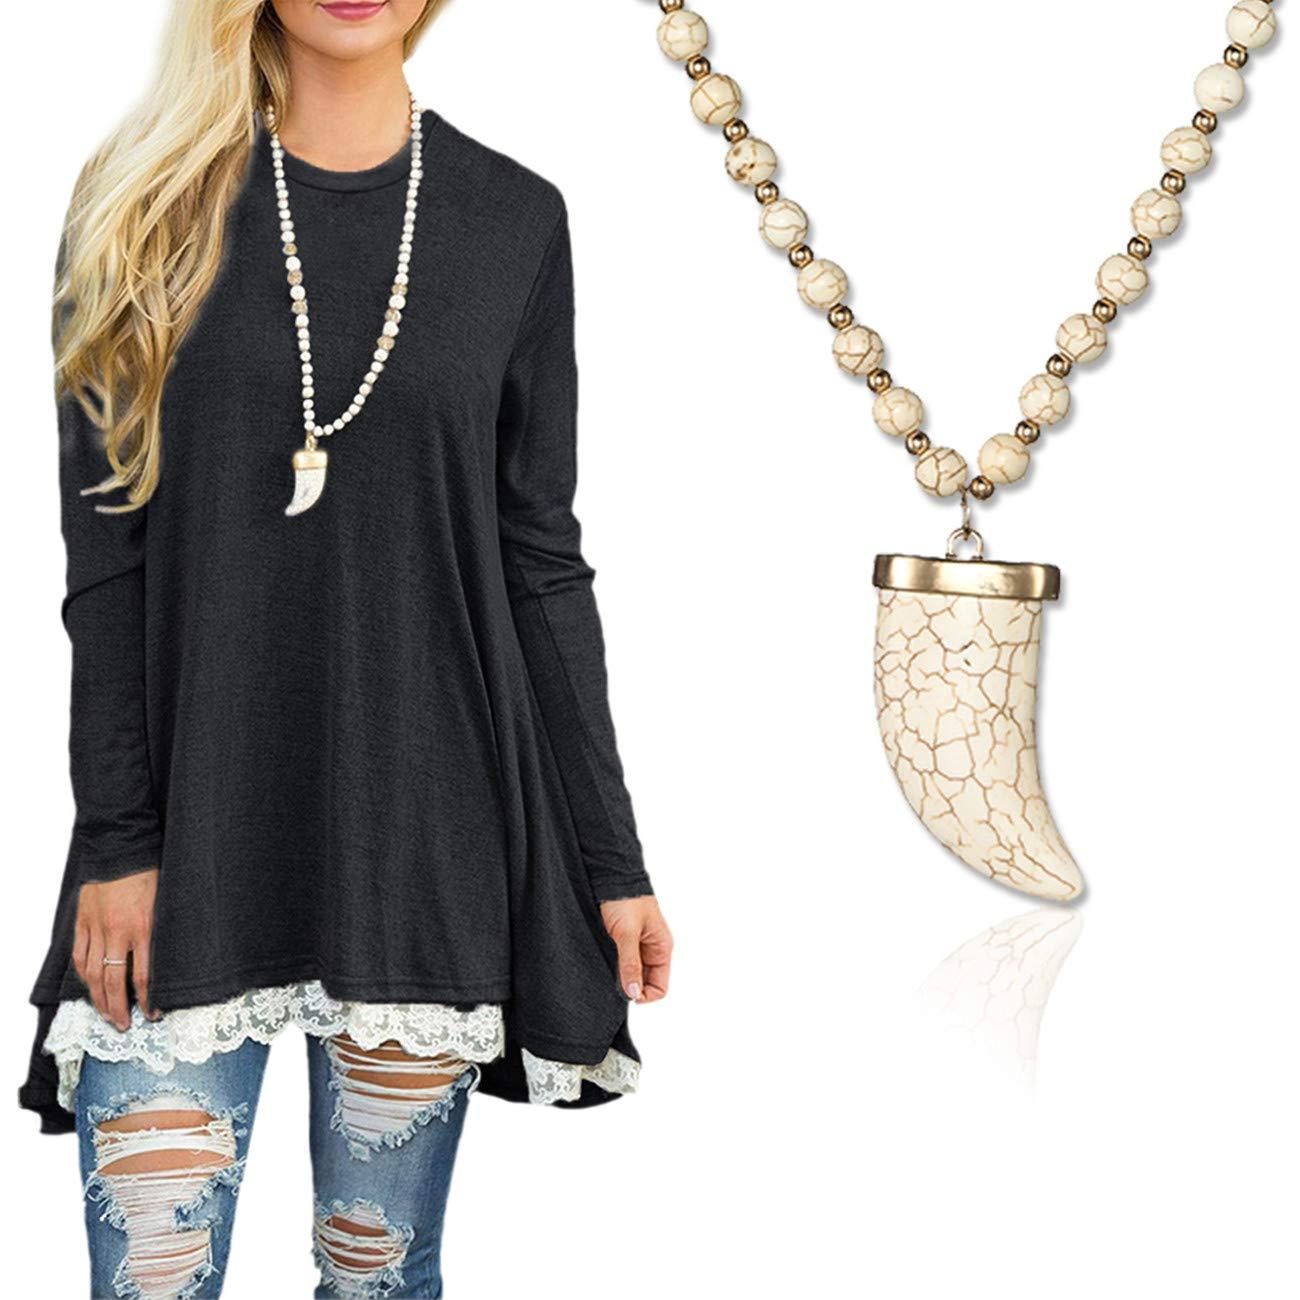 Sanifer Long Bead Necklace Crescent Moon Pendant Strand Necklace Sweater Necklace by Sanifer (Image #1)